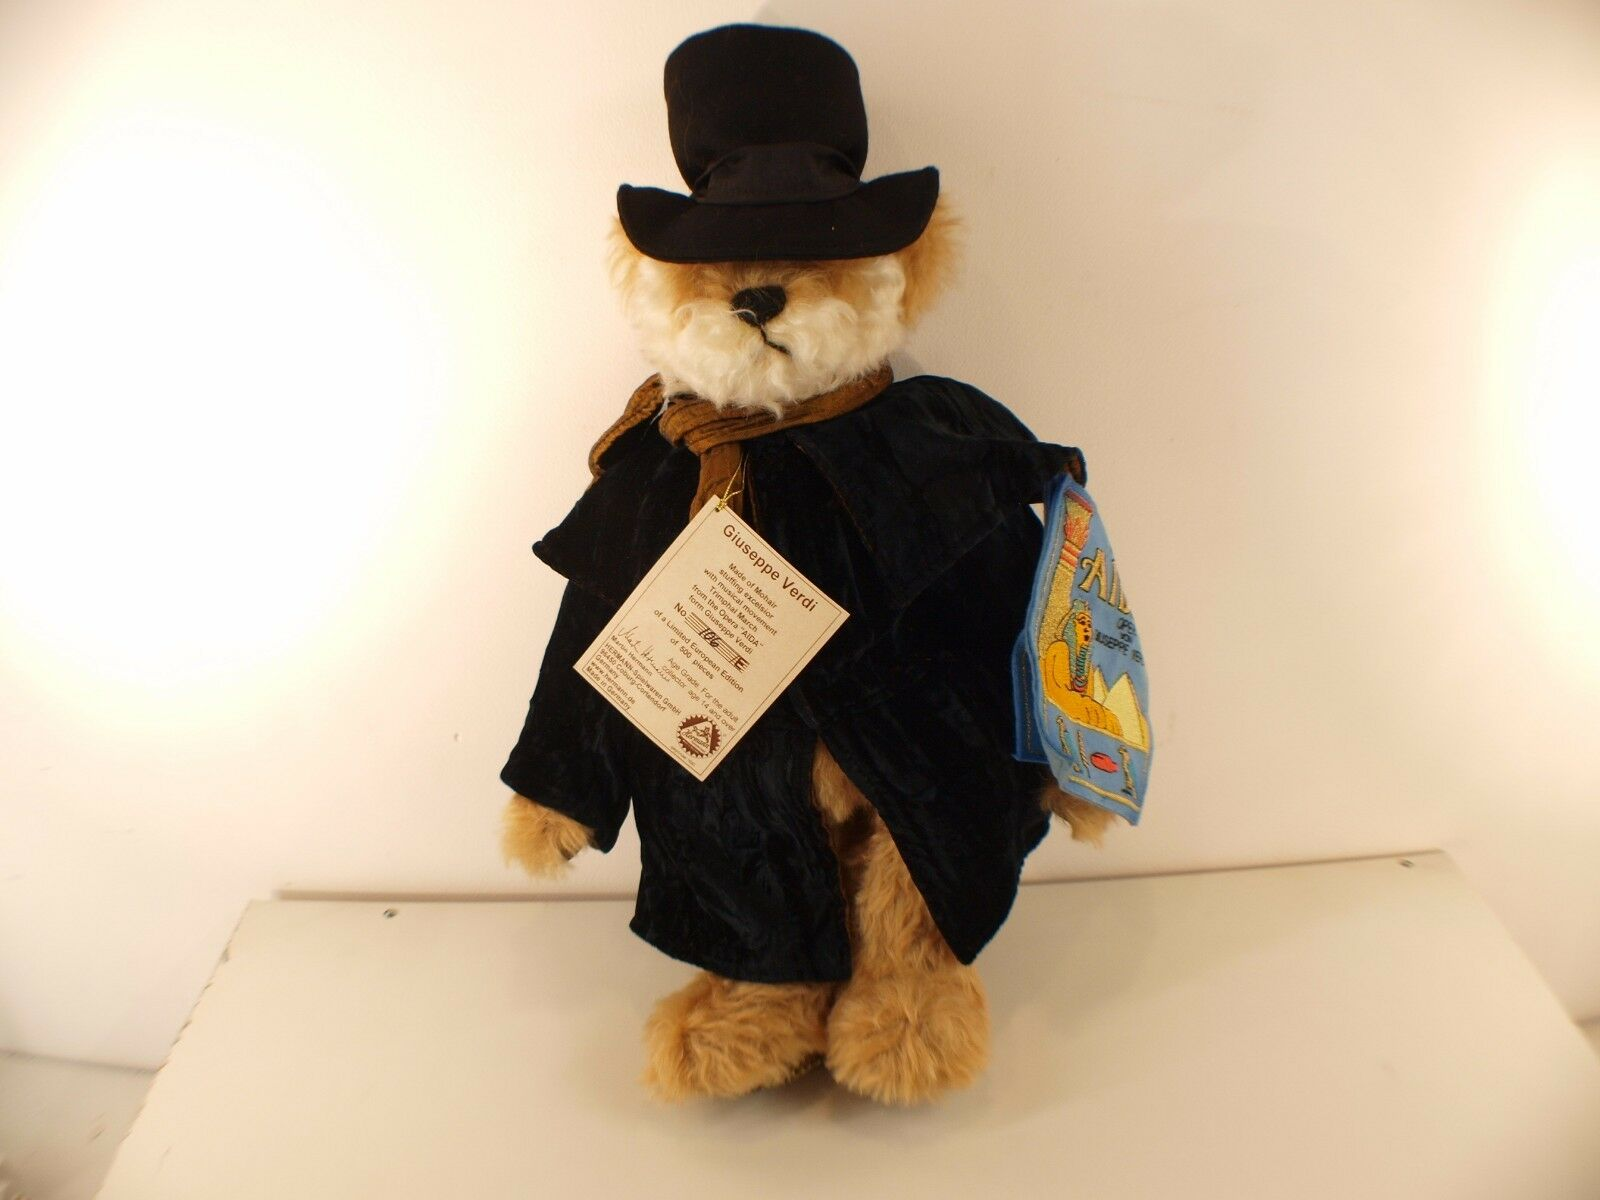 Hermann ours Bear Giuseppe Verdi Aida nounours peluche 45 cm neuf n°106 500 ex